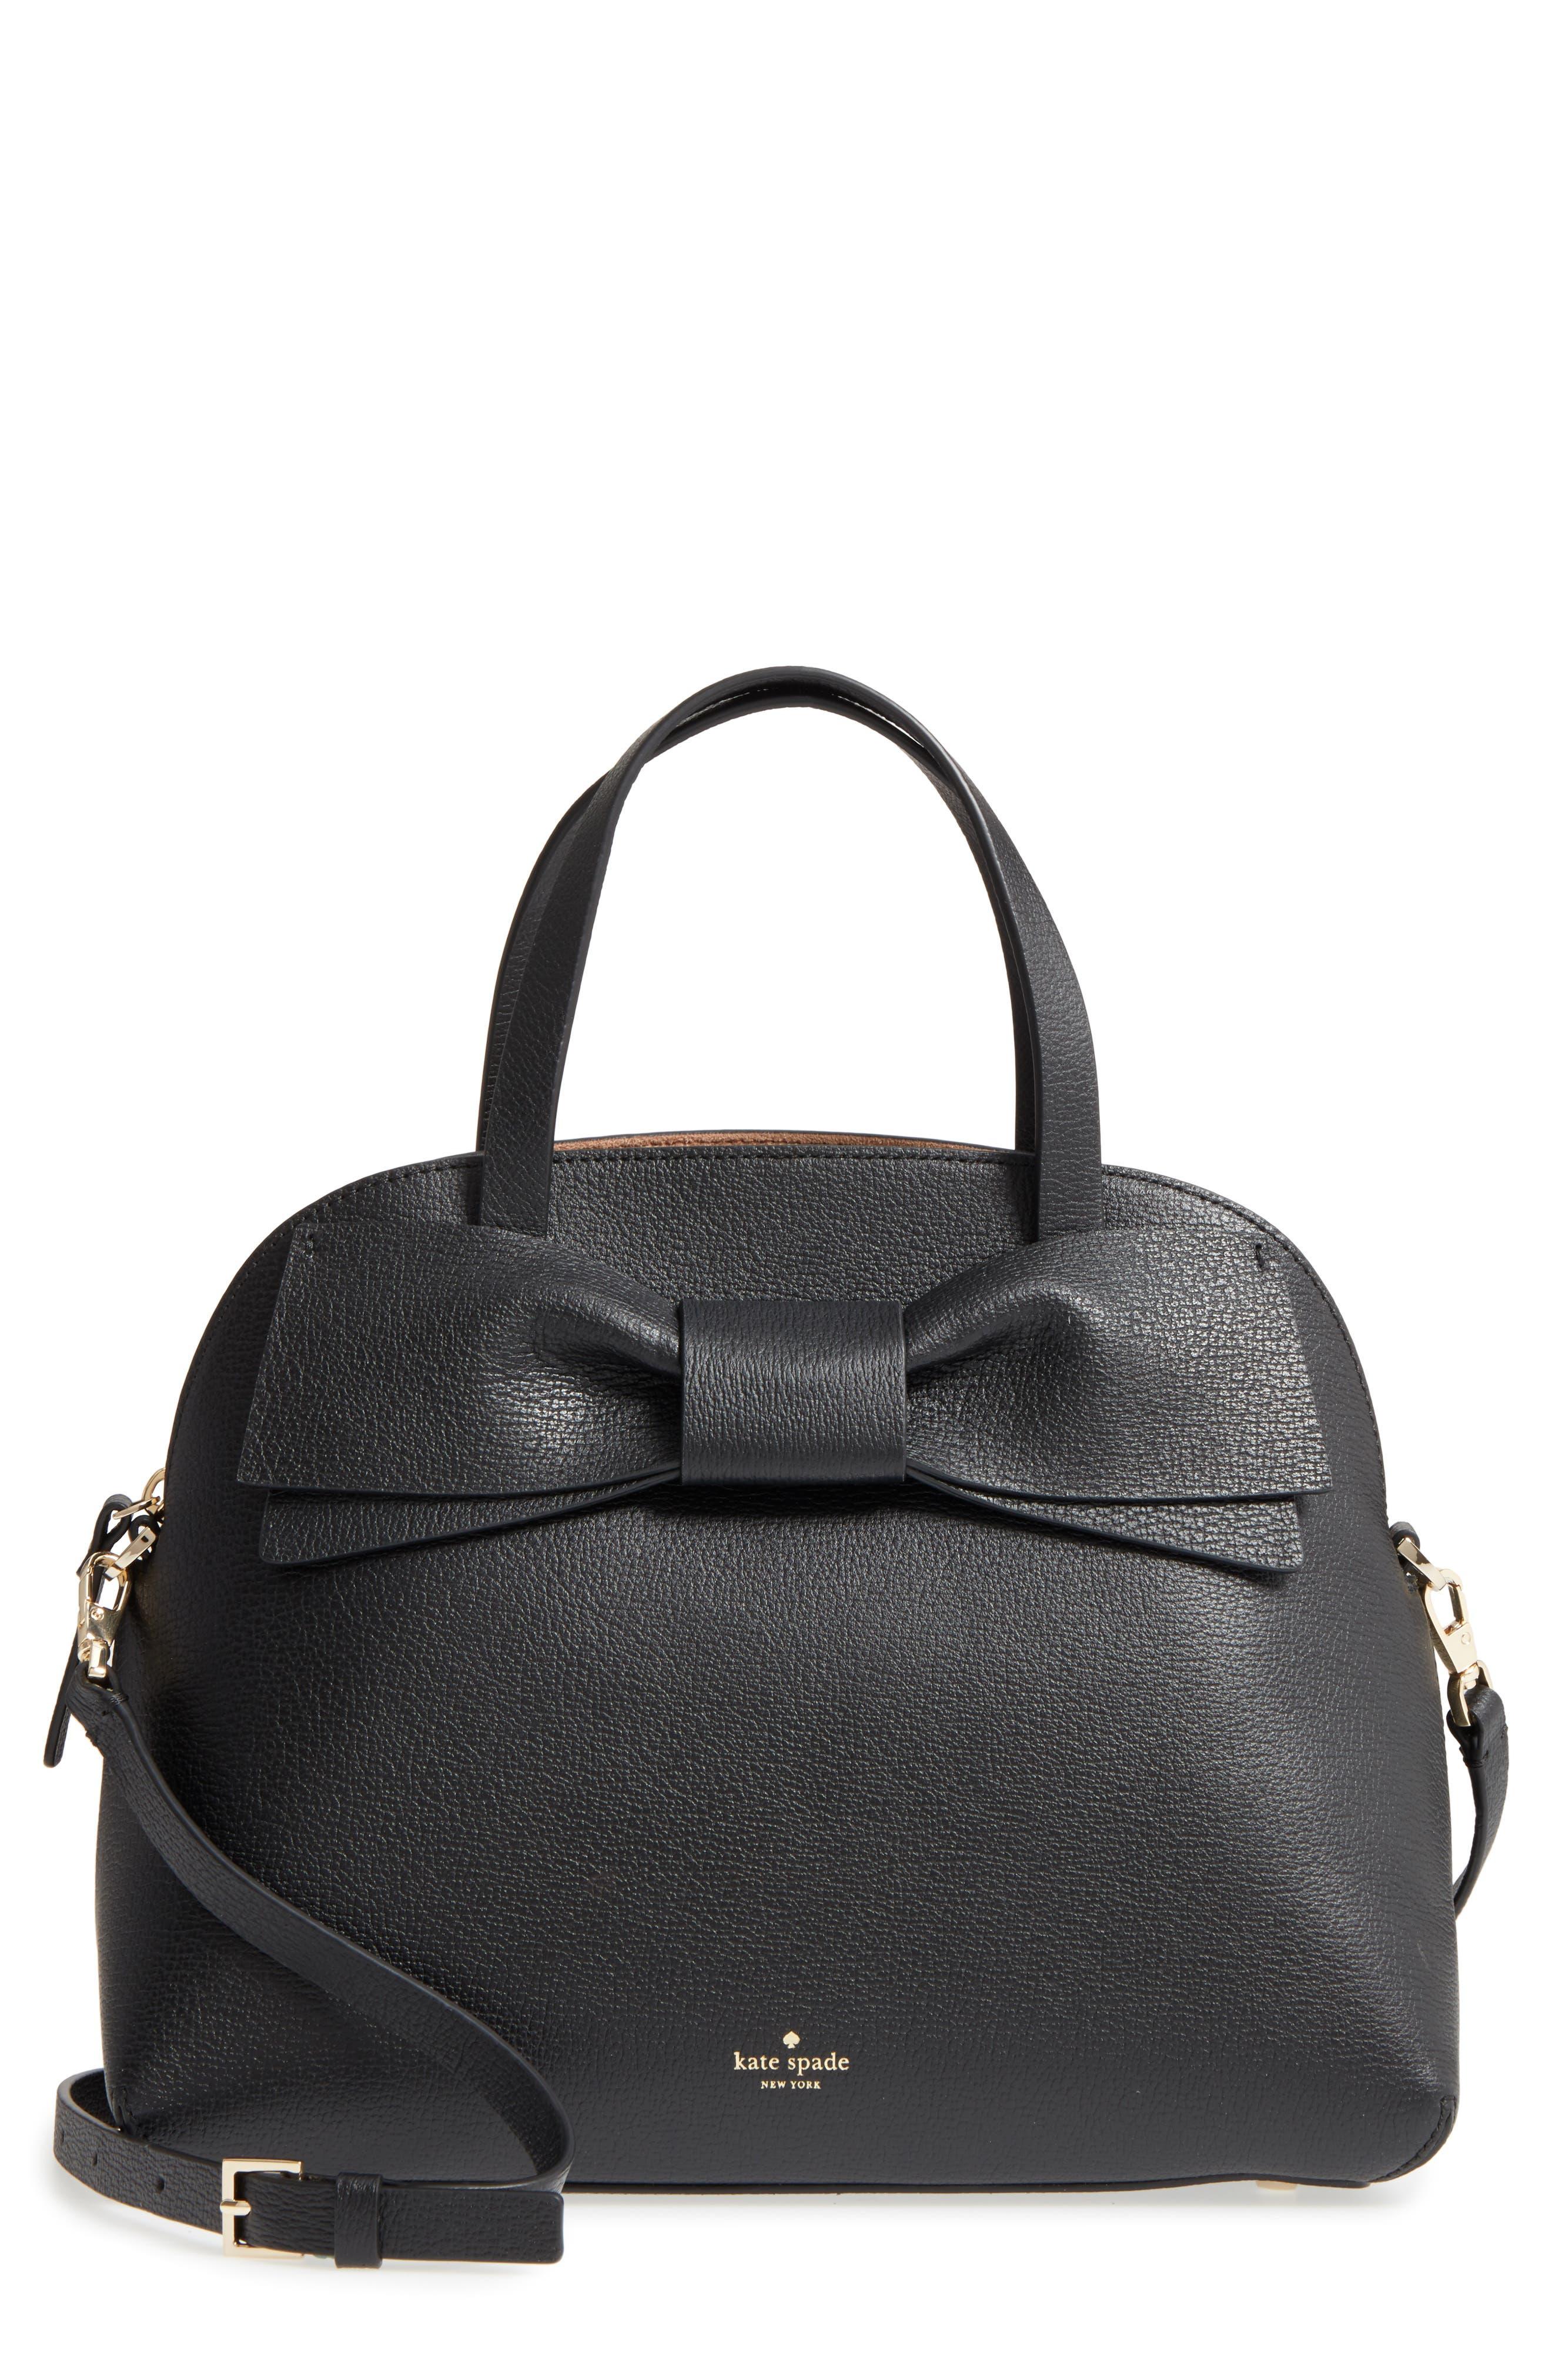 KATE SPADE NEW YORK olive drive lottie leather satchel, Main, color, 001